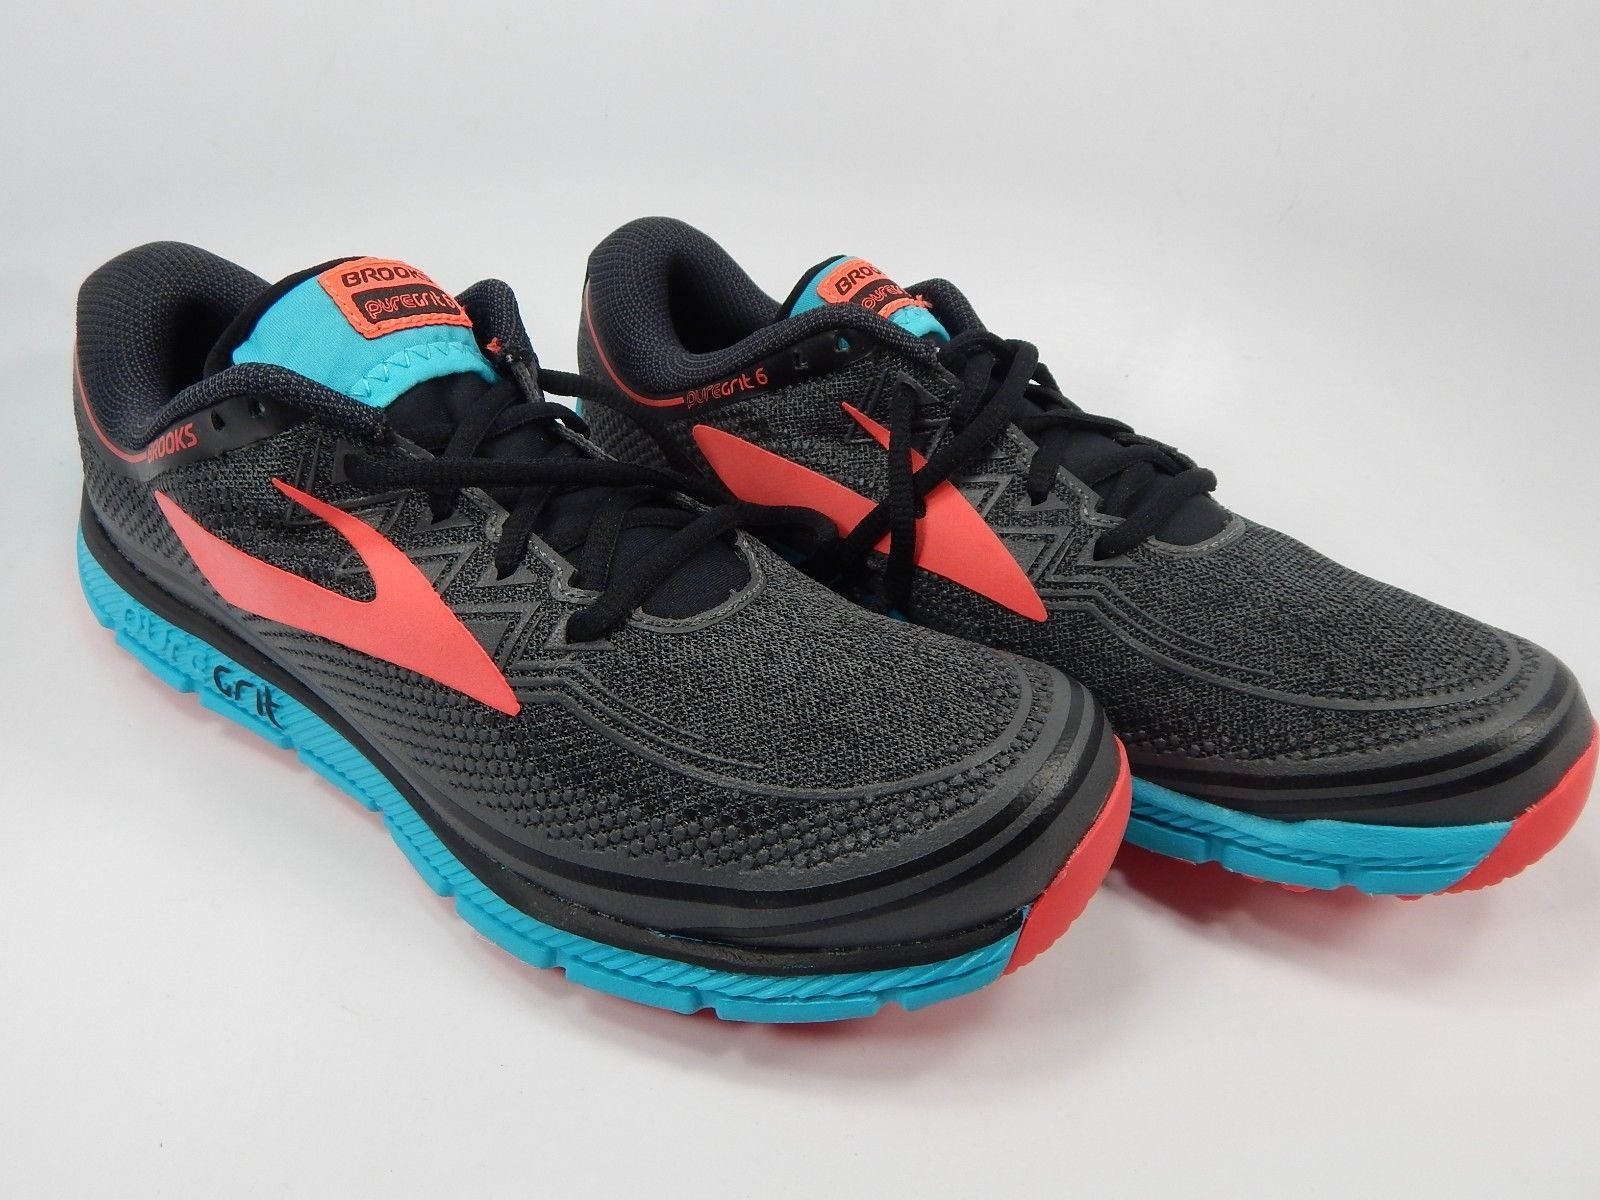 Brooks Pure Grit 6 Size US 10.5 M (B) EU 42.5 Women's Running Shoes 1202481B014